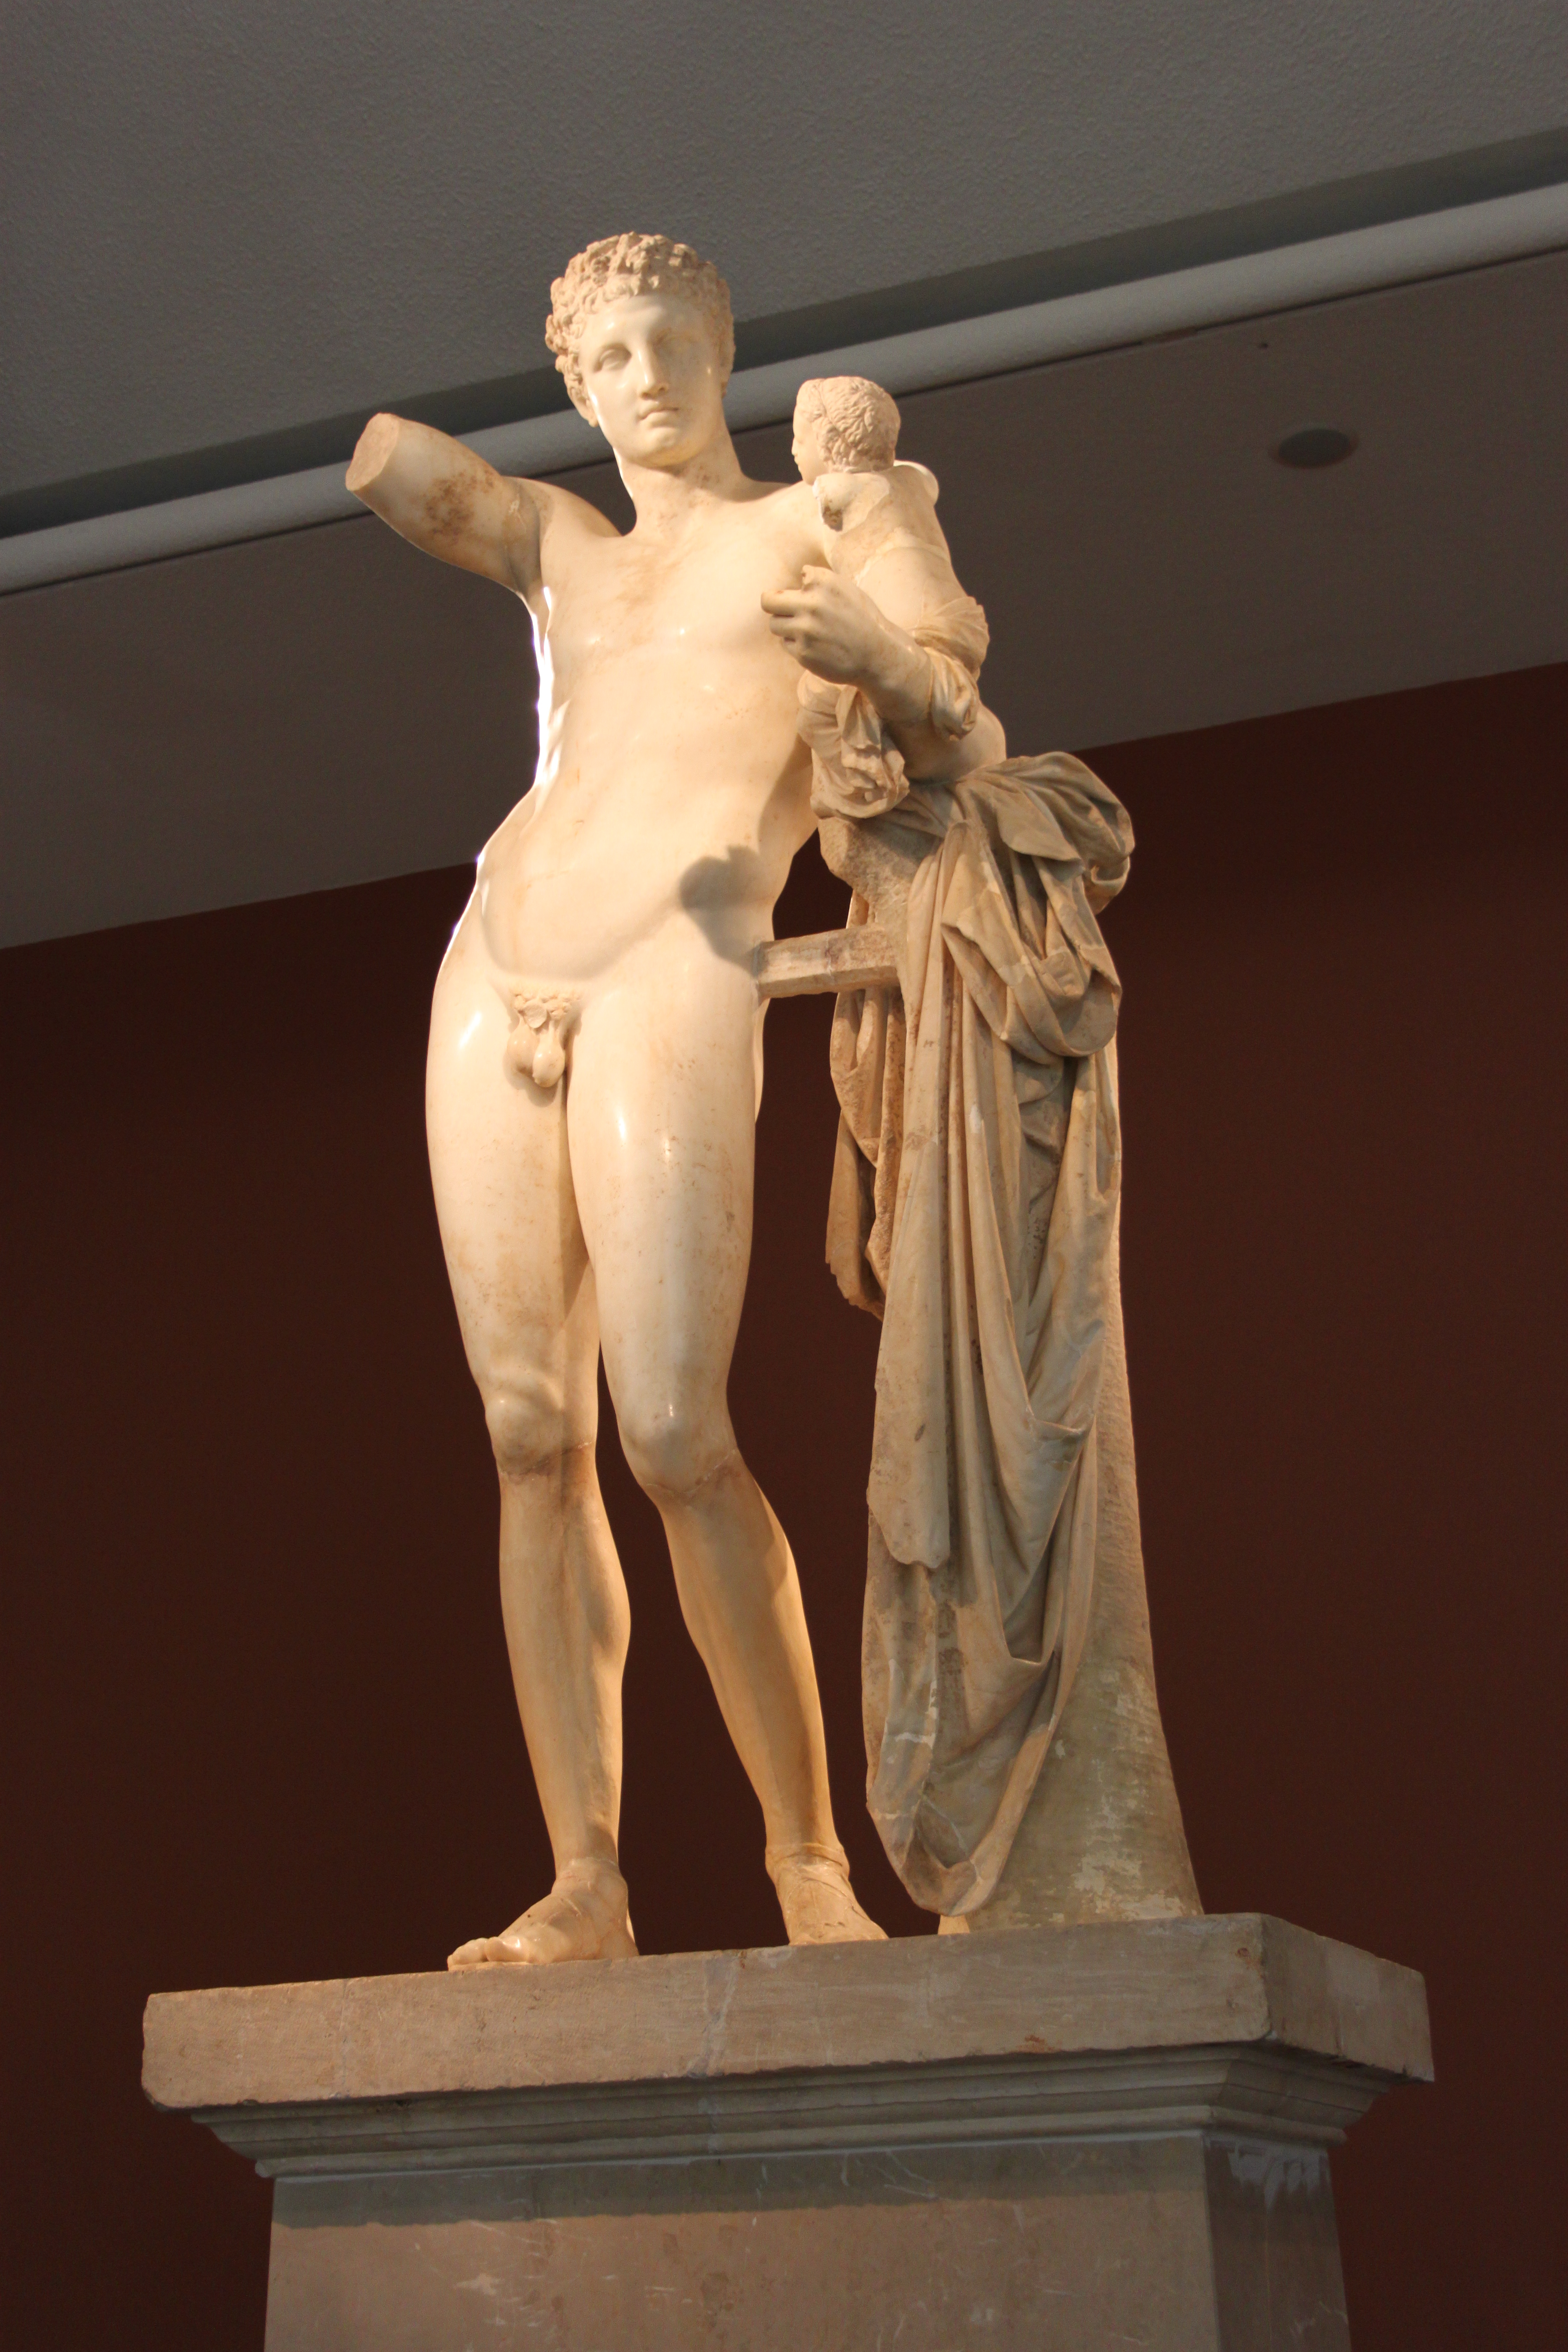 hermes and dionysus sculpture